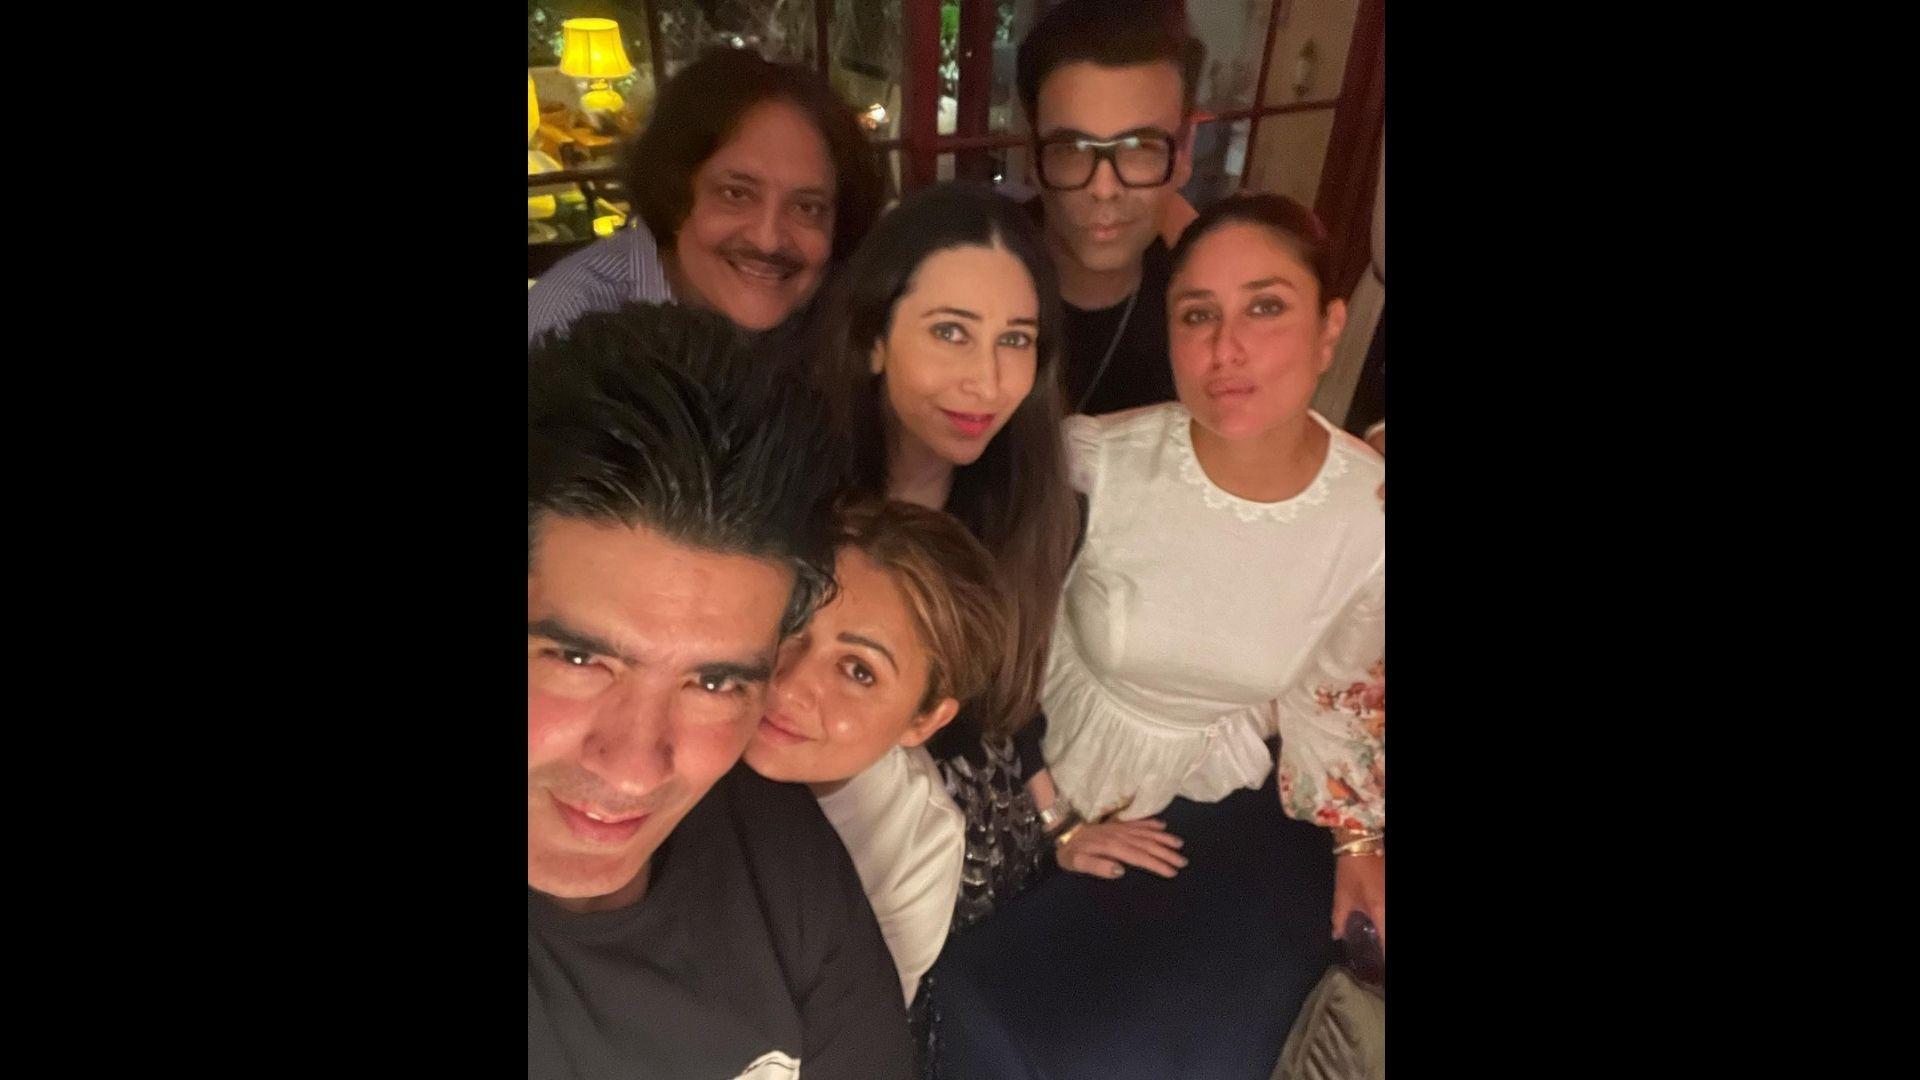 Kareena Kapoor Khan Hosts A House Party; Sister Karisma Kapoor, BFF Karan Johar And Manish Malhotra Arrived In Style